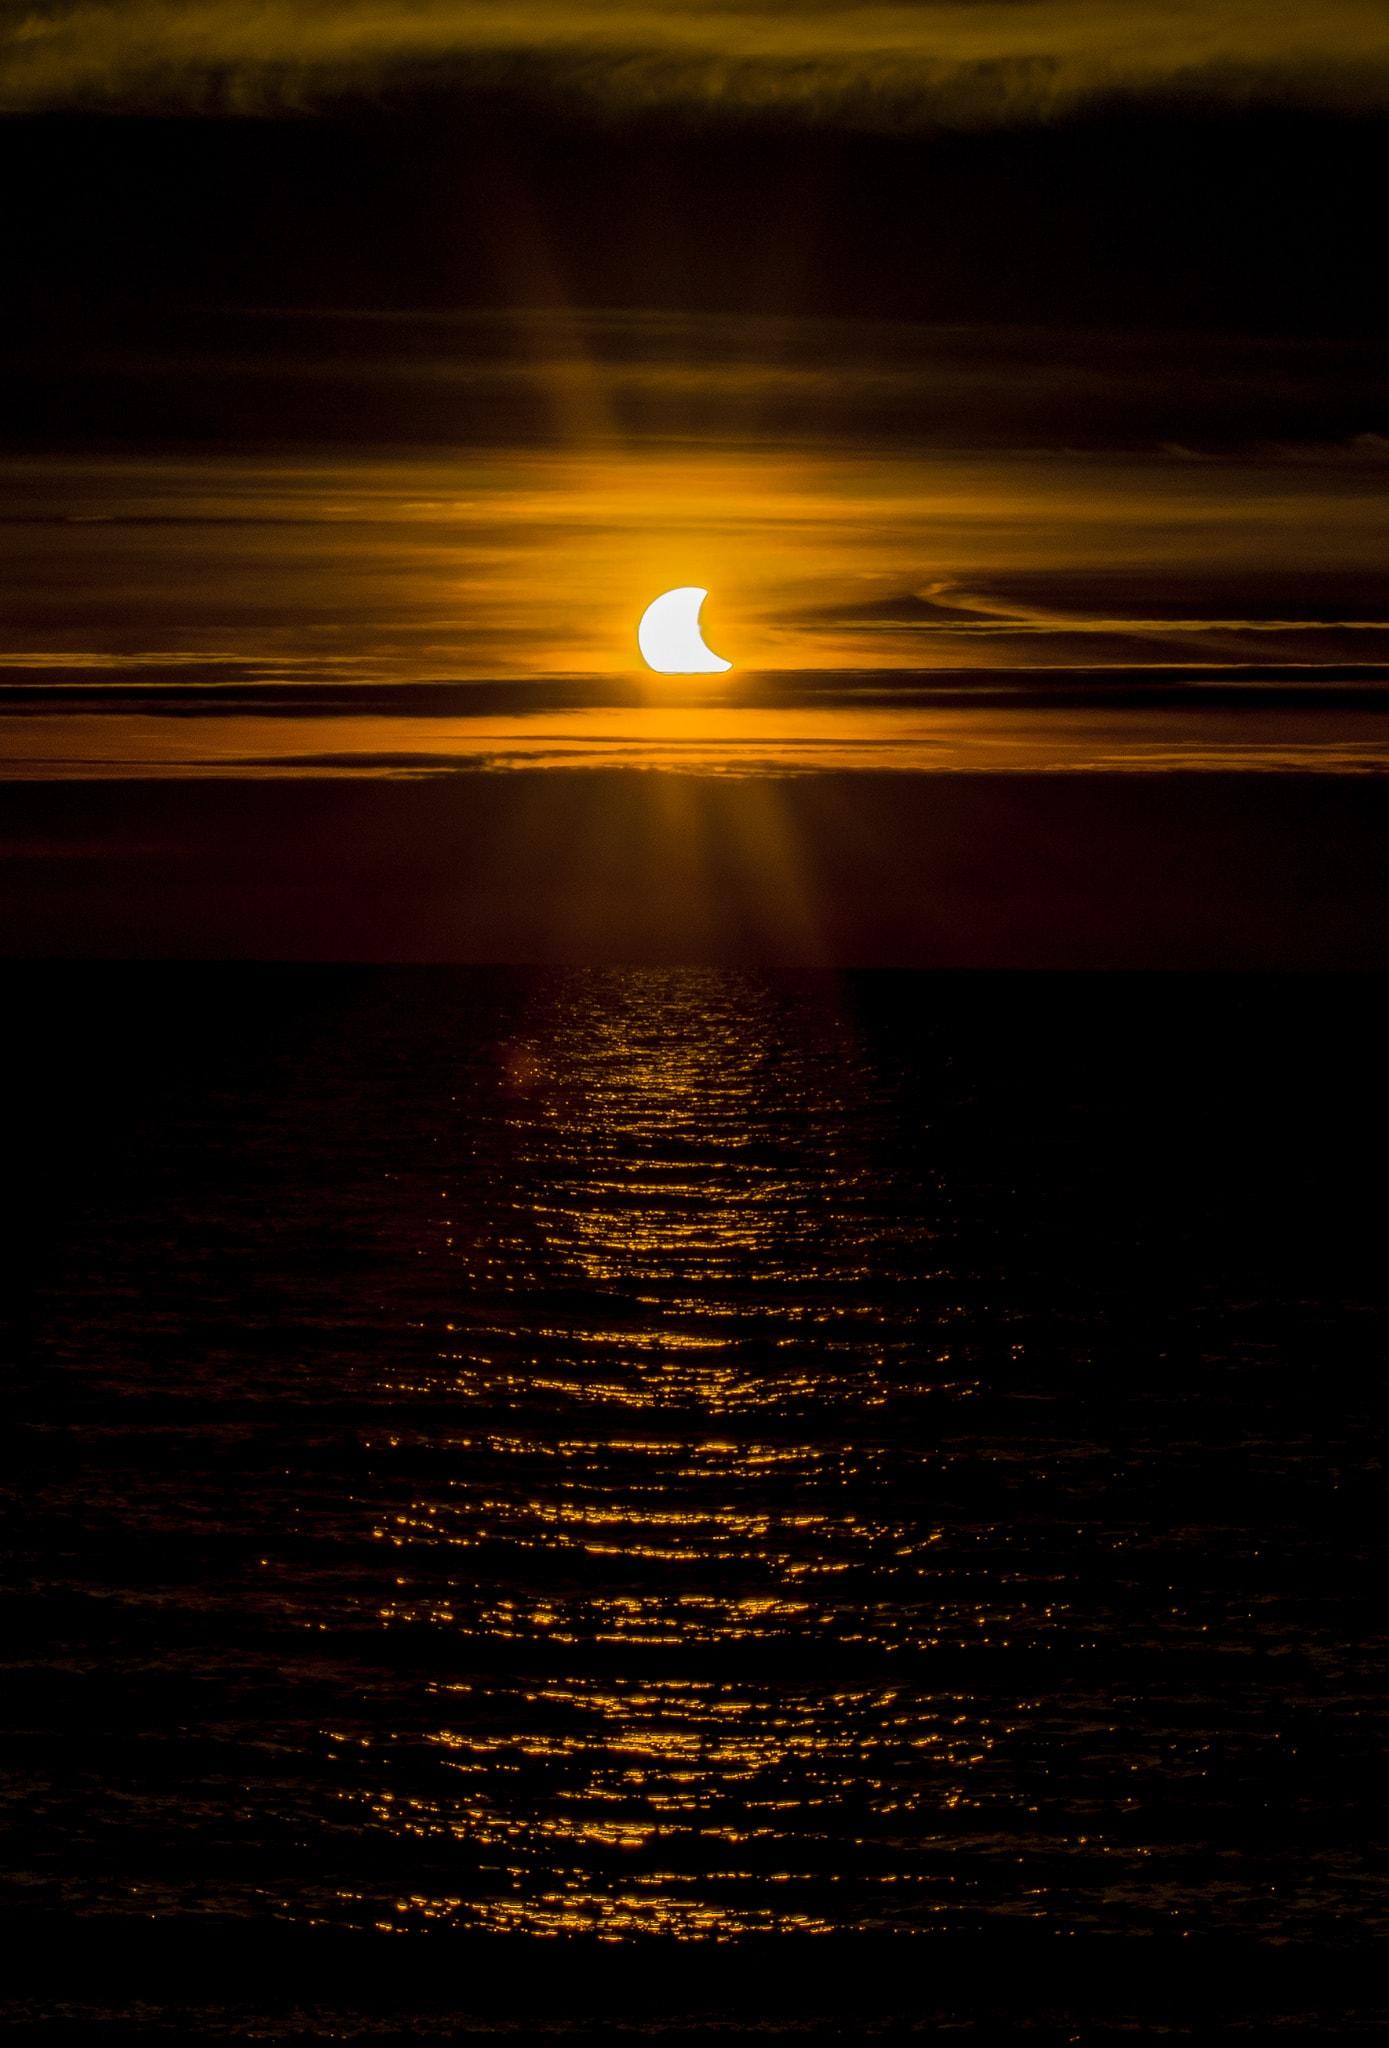 Eclipse fotografiafo por Gary Lloyd-Rees